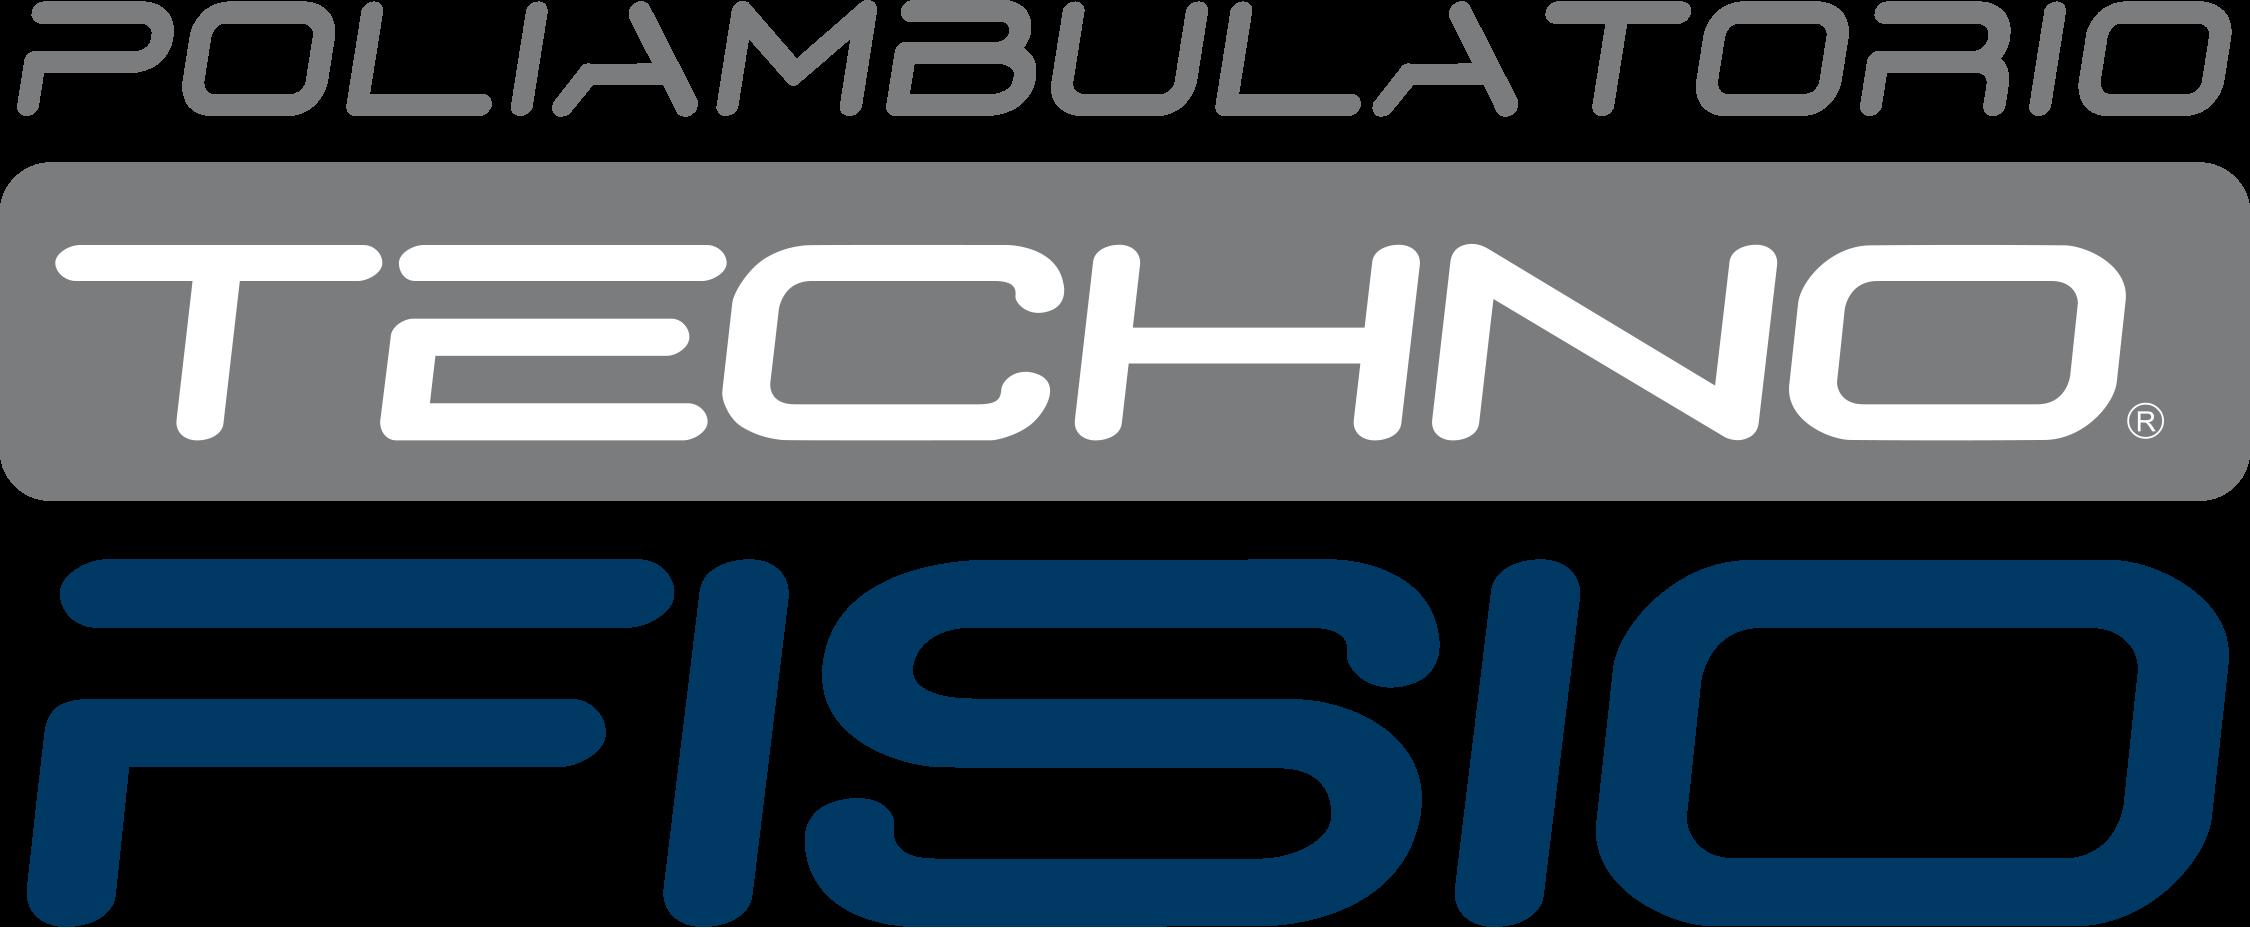 Technofisio